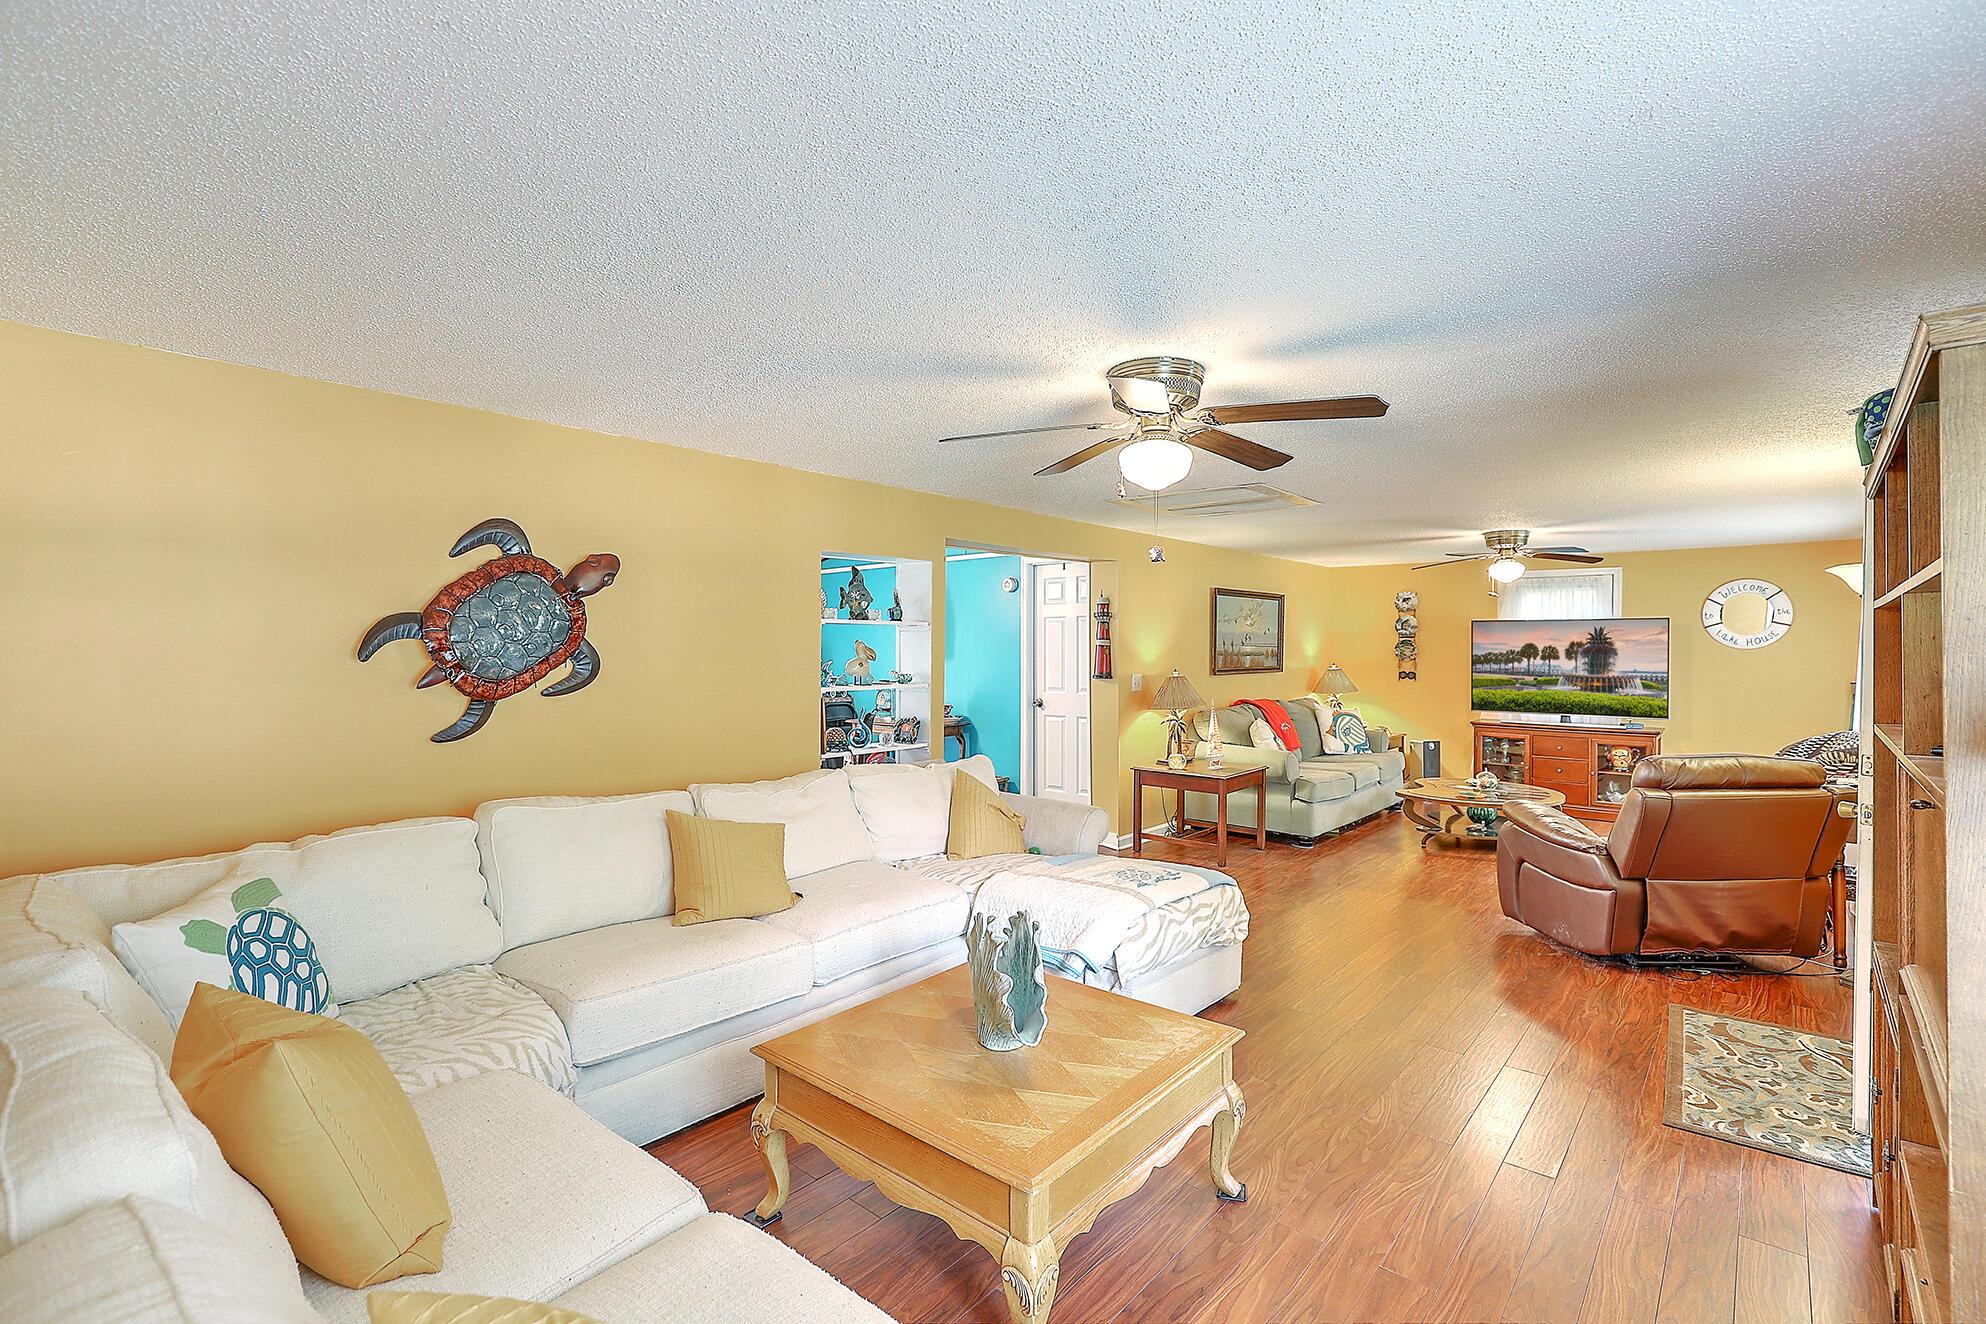 Cross Area (West) Homes For Sale - 128 Cherry Grove, Cross, SC - 32